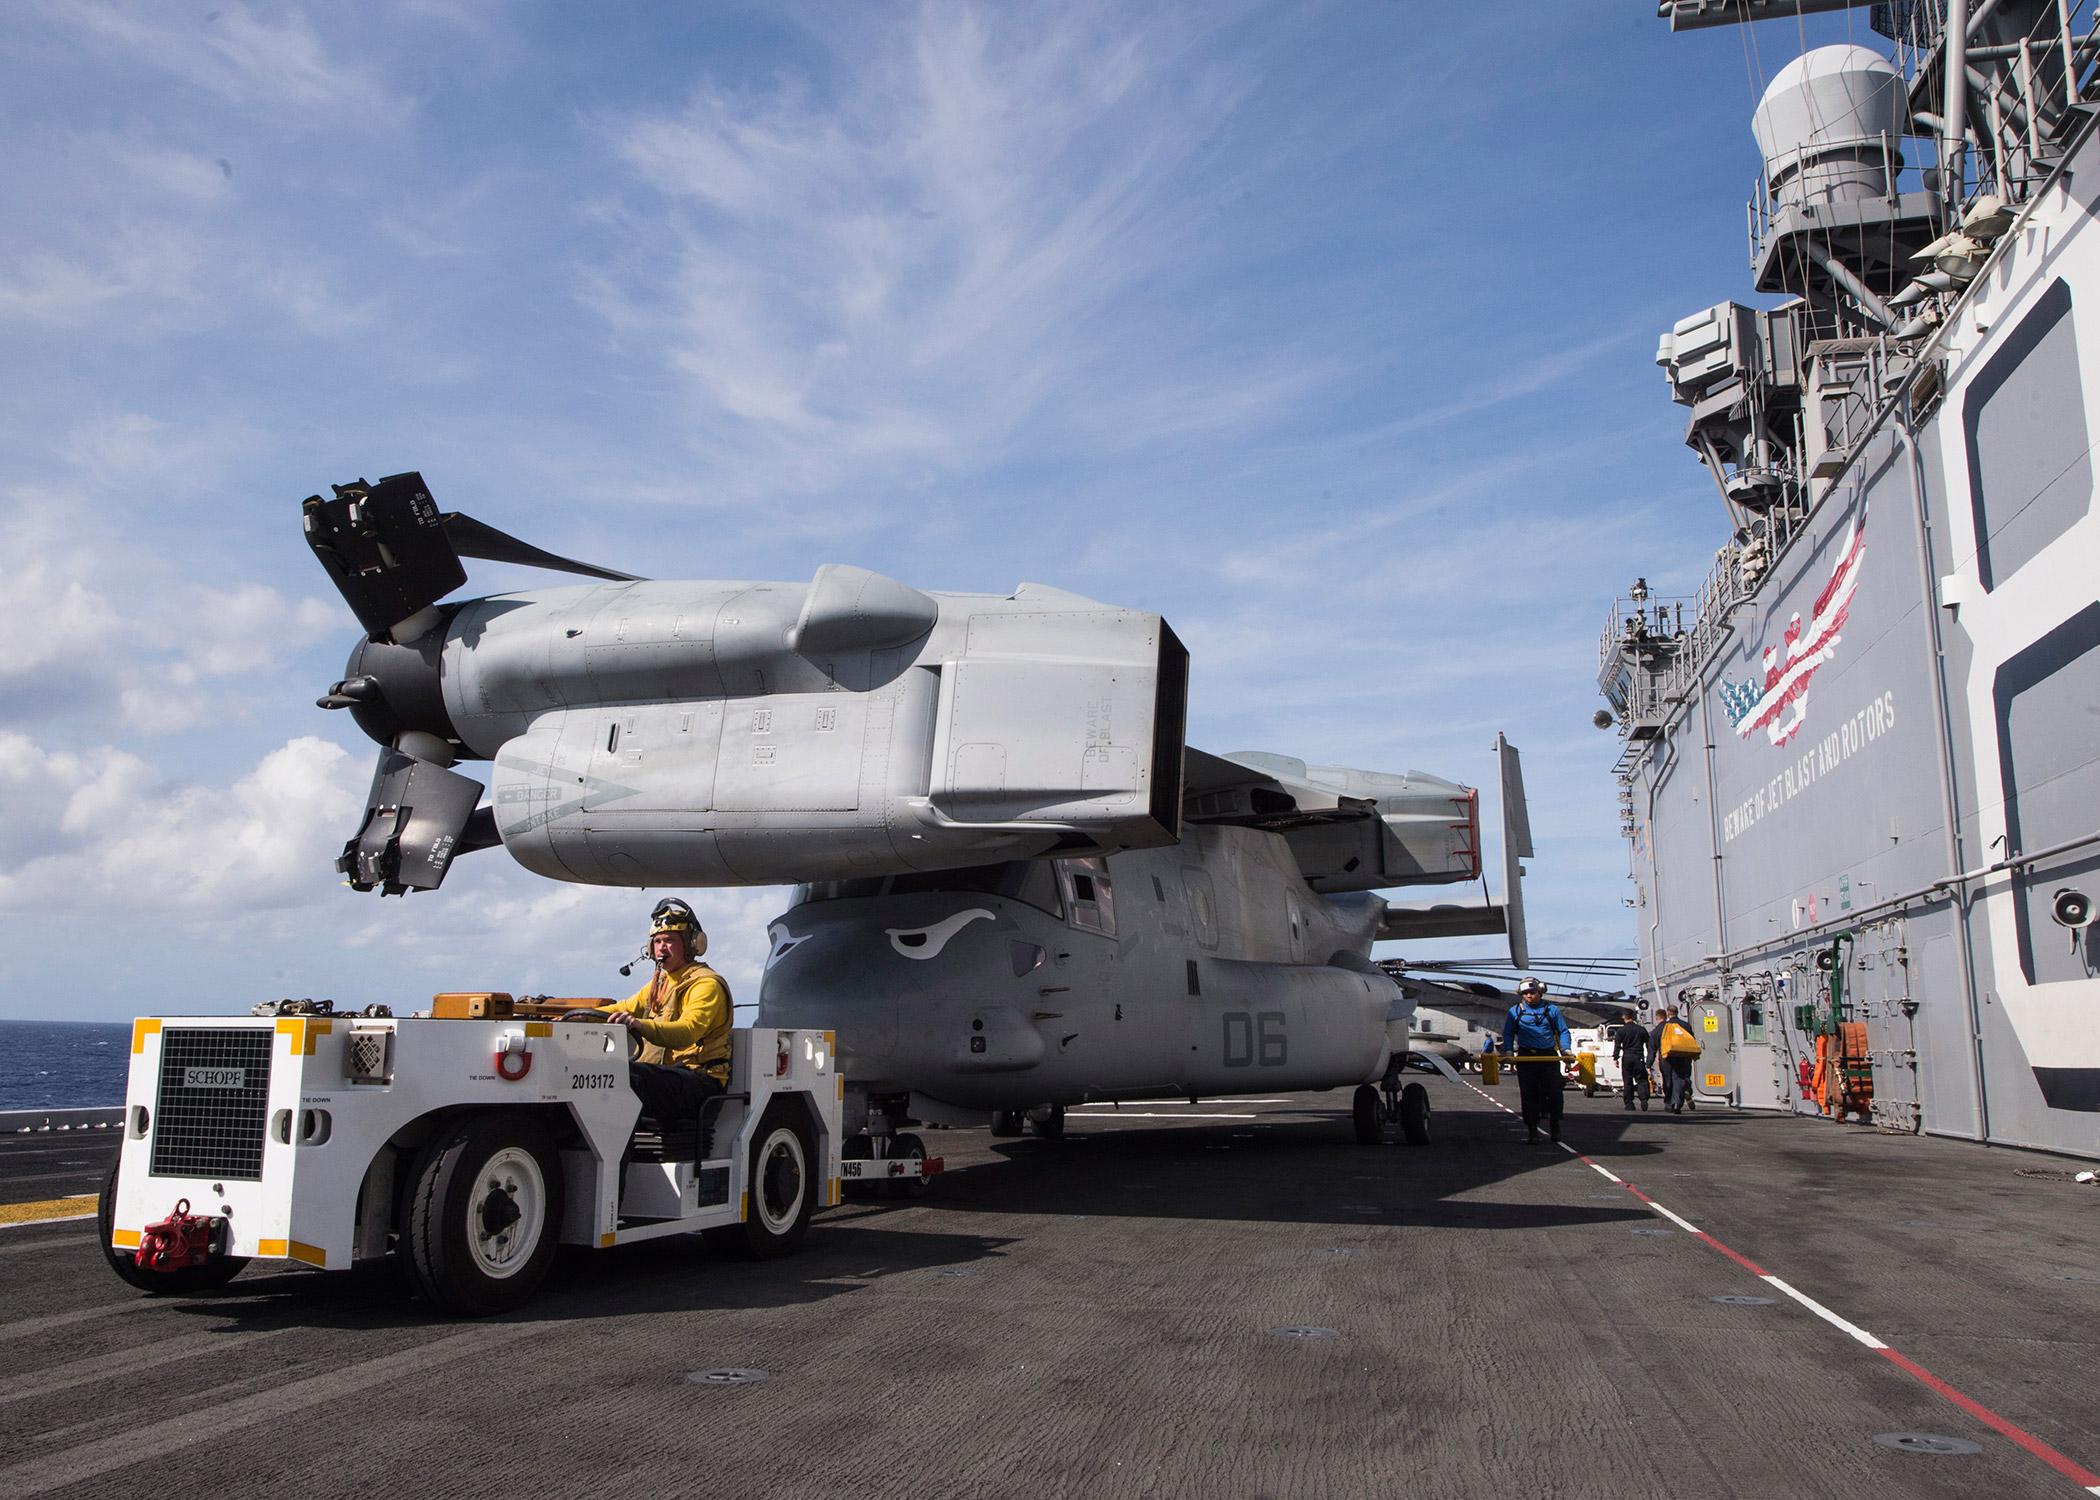 Младший офицер 3-го класса Вилли Кросон буксирует конвертоплан MV-22 Osprey на летной палубе десантного корабля USS Makin Island (LHD 8). (Фото: ВМС США).